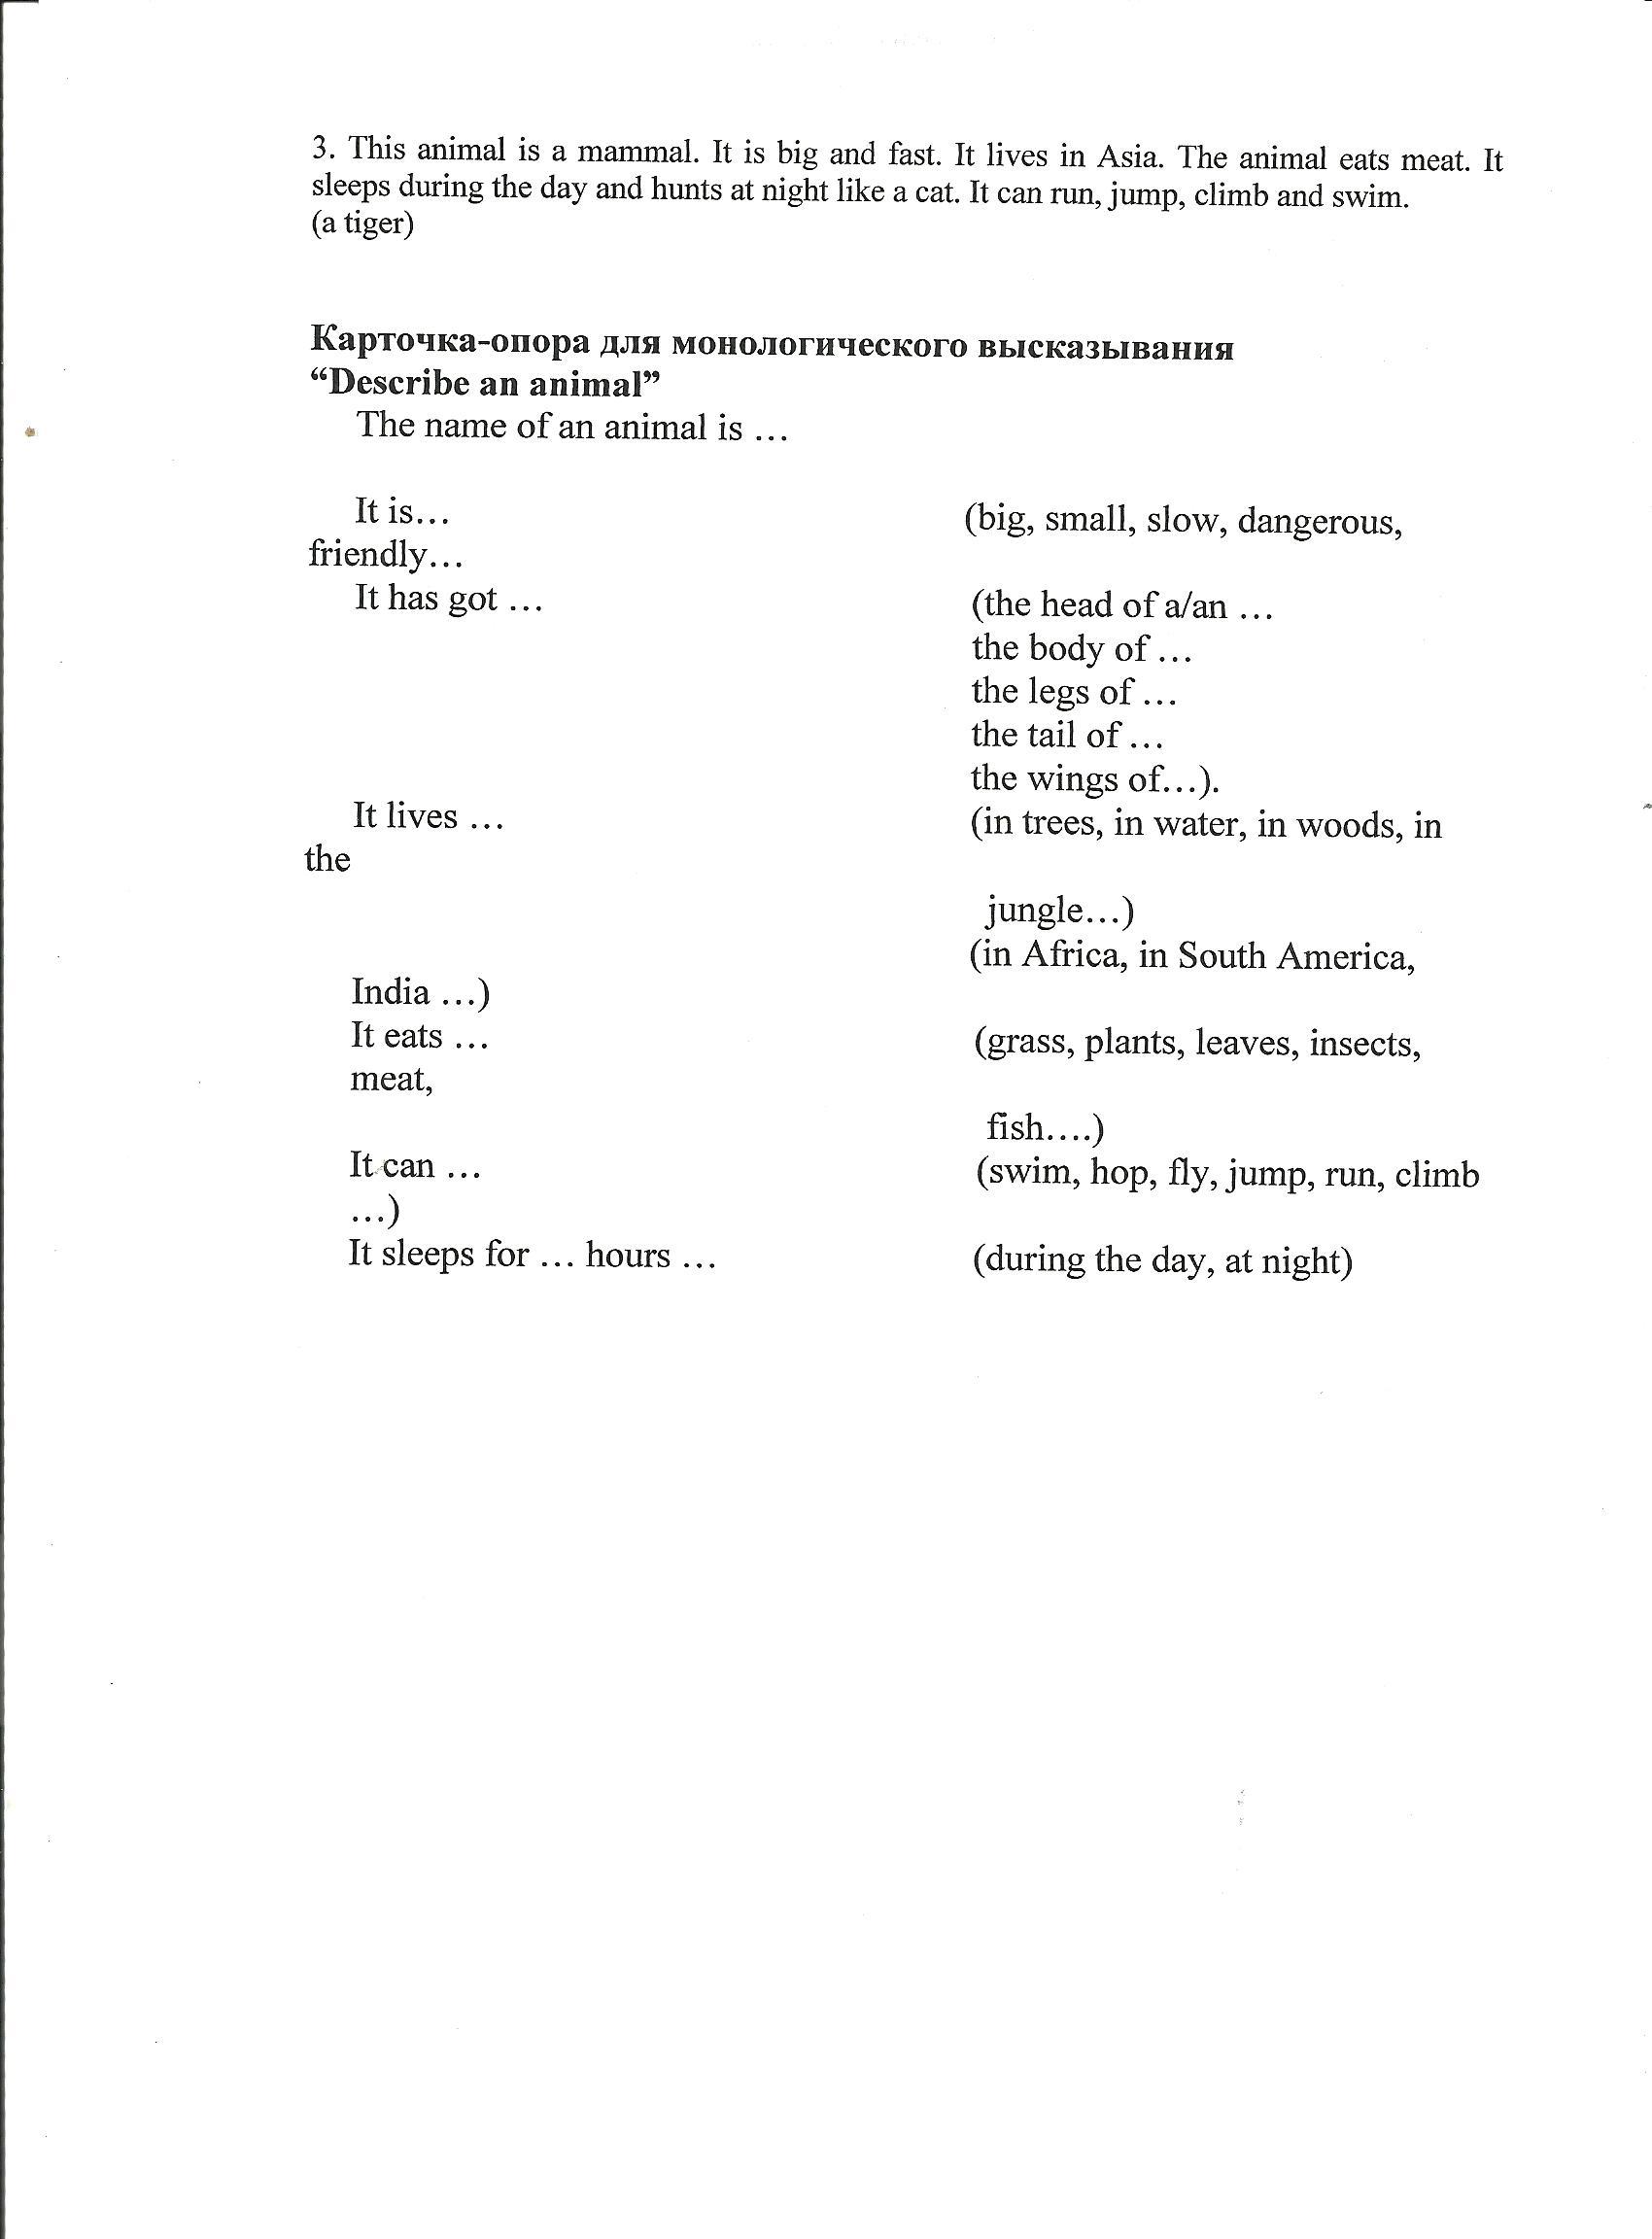 G:\Урок английского языка Животные Сафари Парка 3 класс УМК Millie учитель Штурмина ОС шк№18\Приложение5.jpg